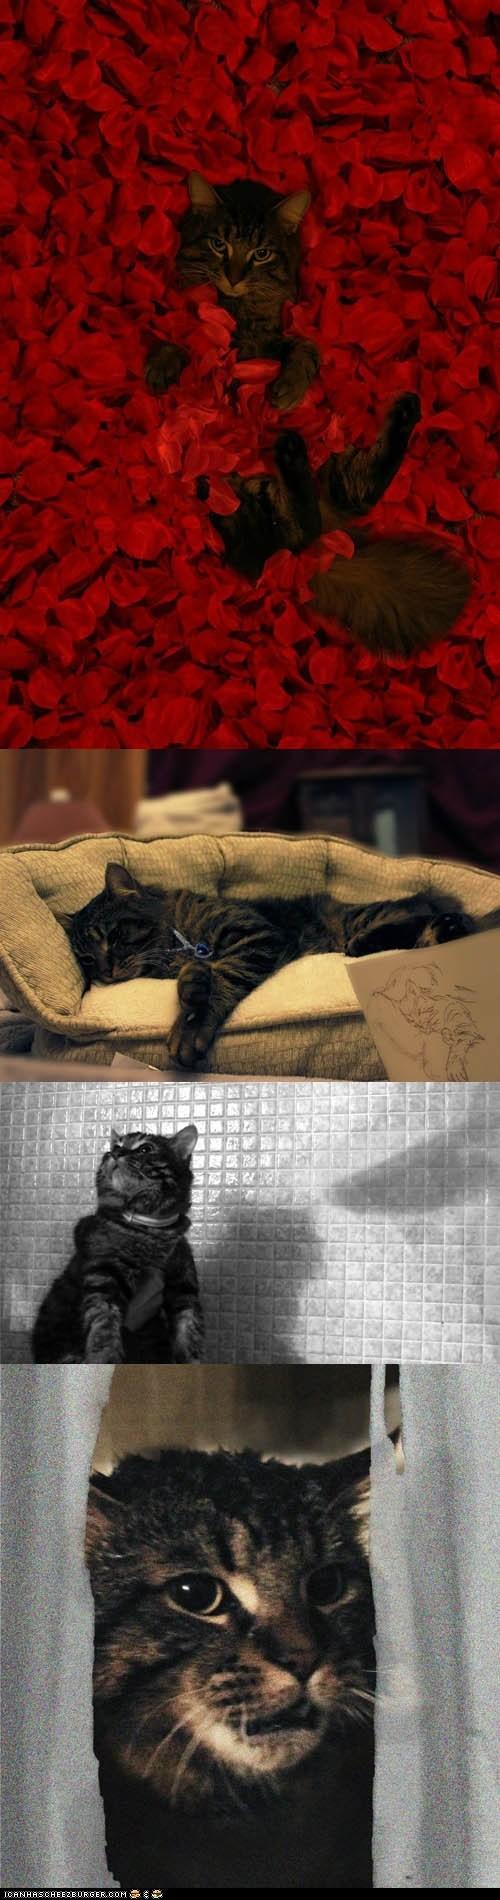 Cats films movies psycho scenes the shining titanic - 6321004288